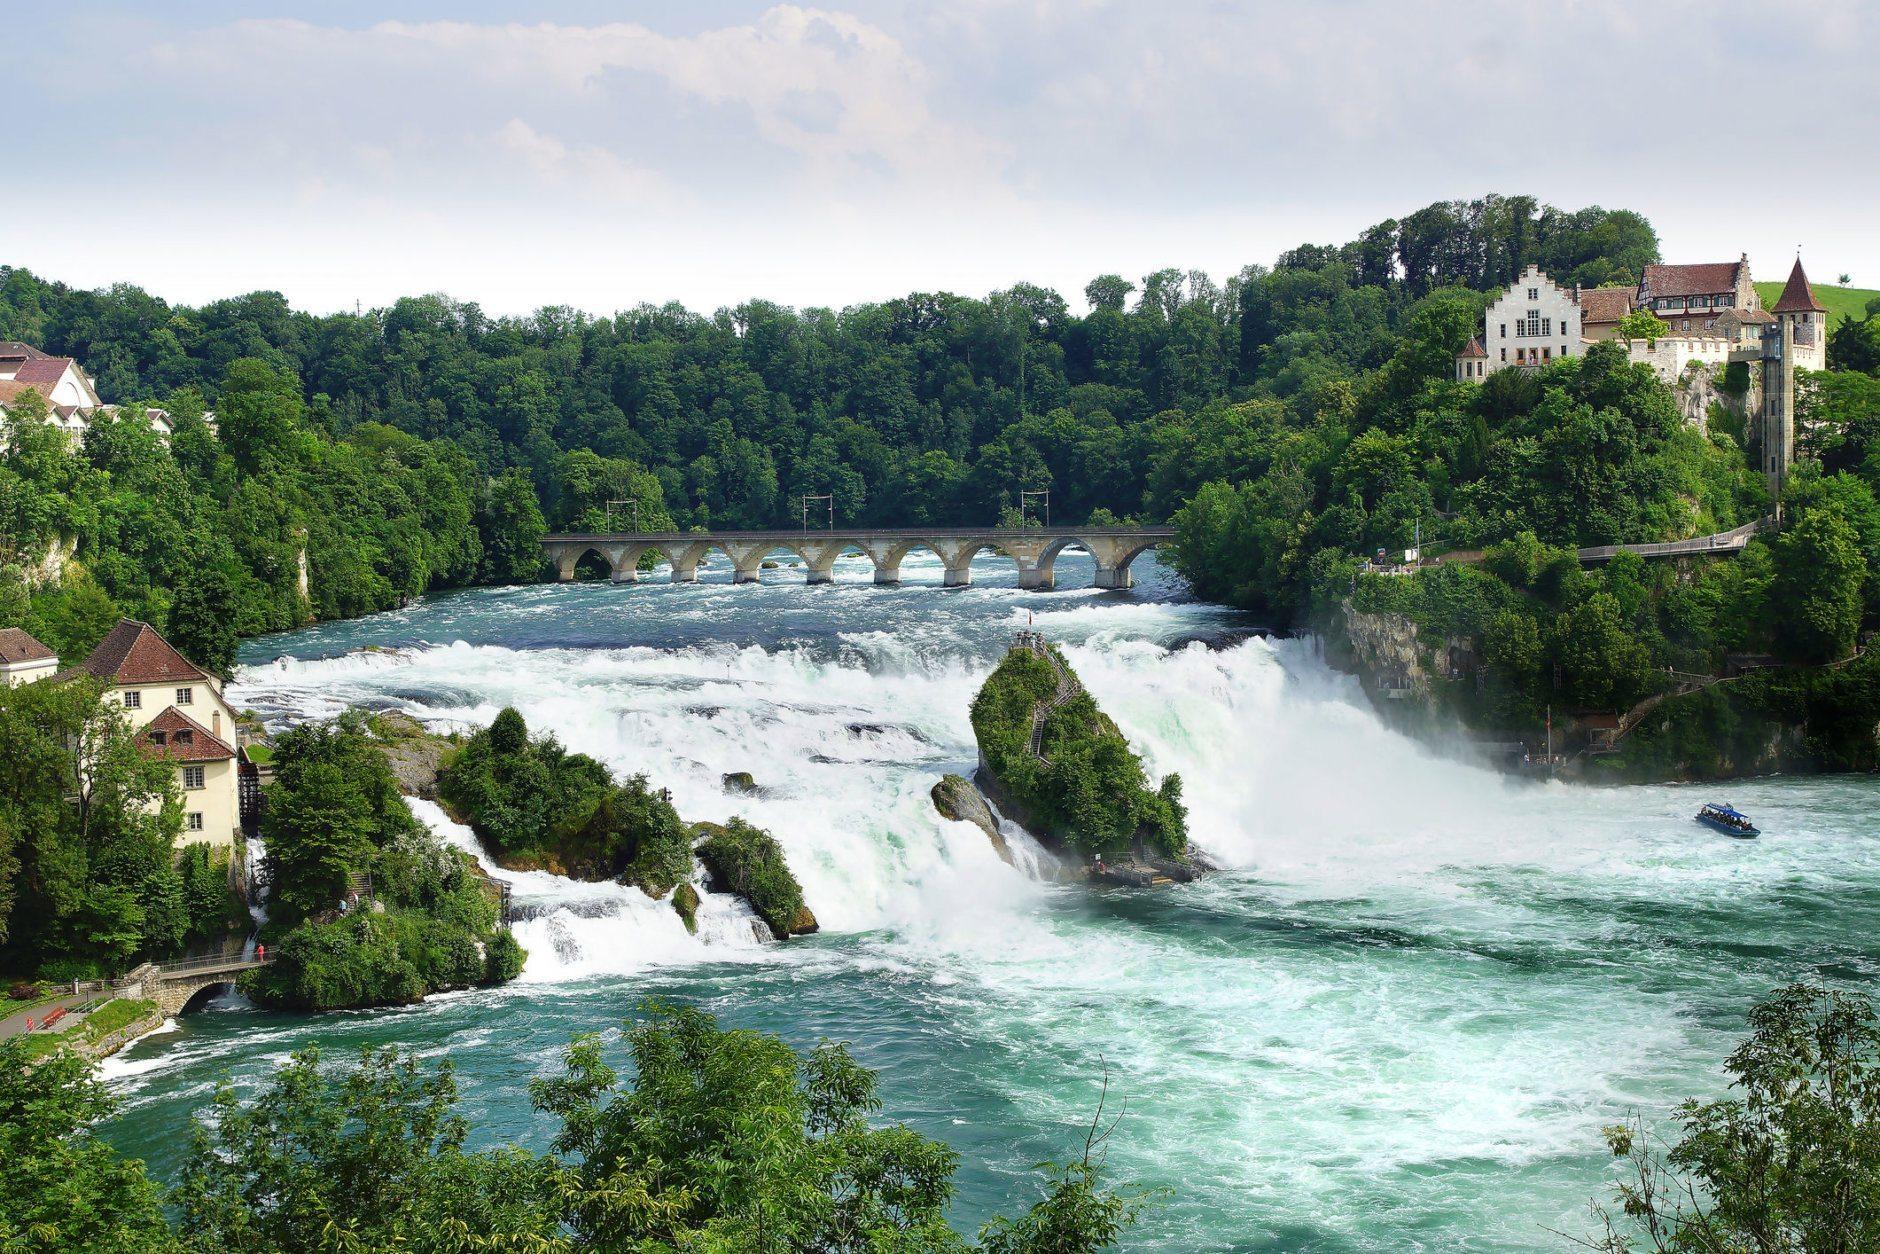 Rhinefall, the largest Waterfall in Europe. Switzerland